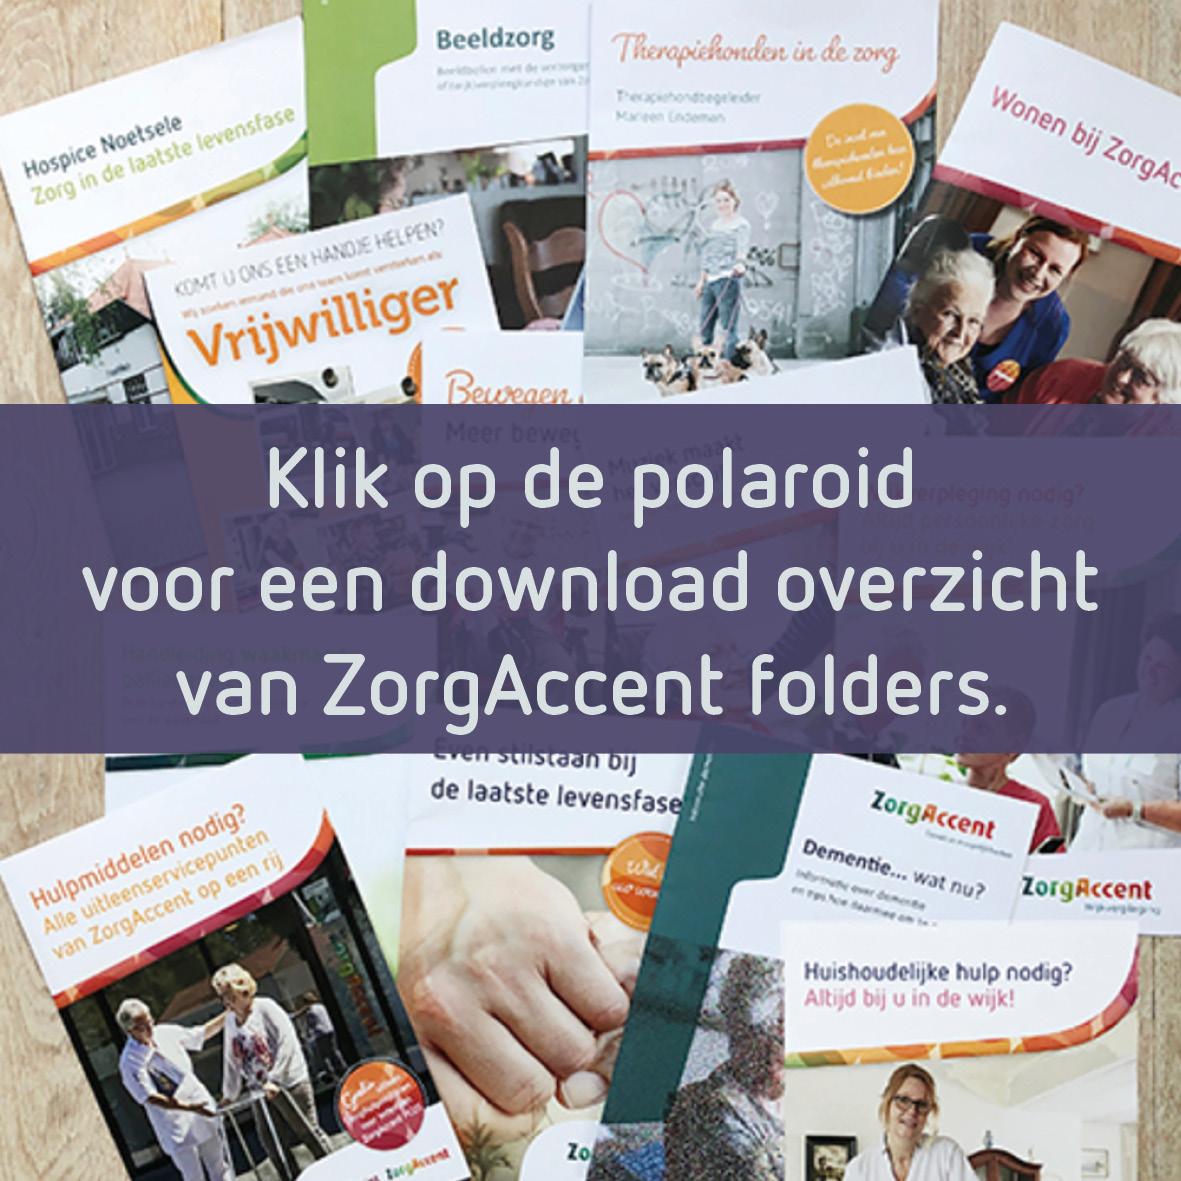 Polaroid_Folders_ZorgAccent_paars